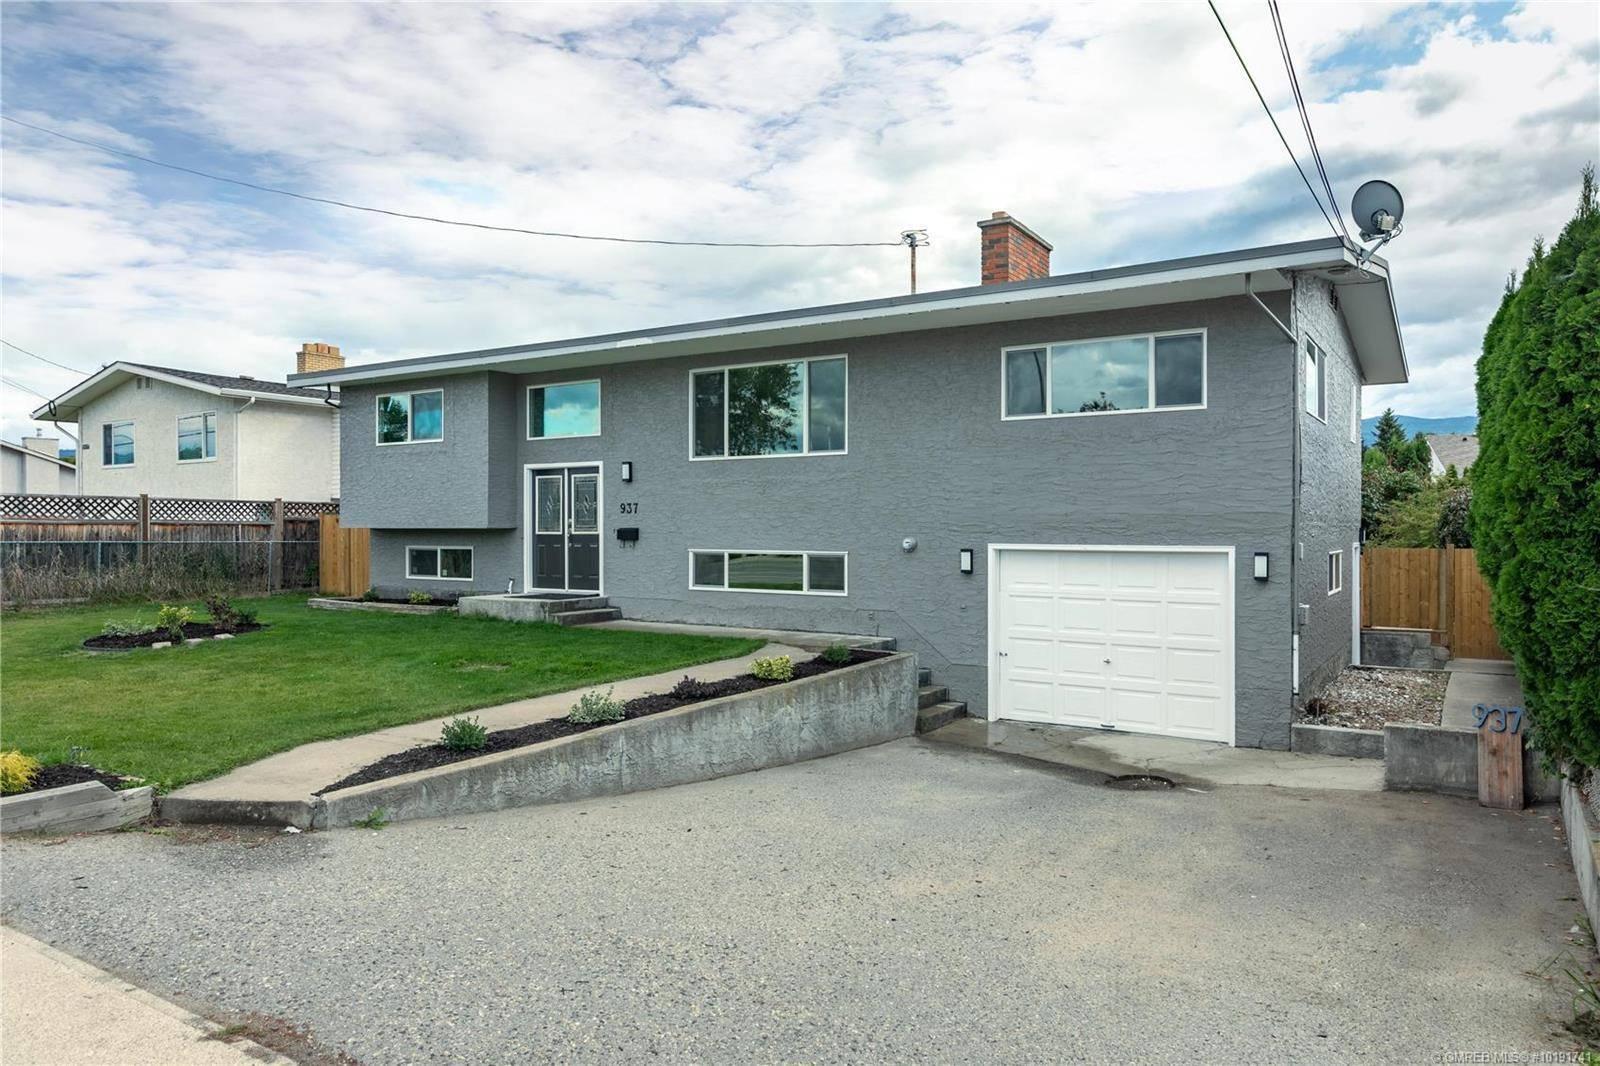 House for sale at 937 Lanfranco Rd Kelowna British Columbia - MLS: 10191741